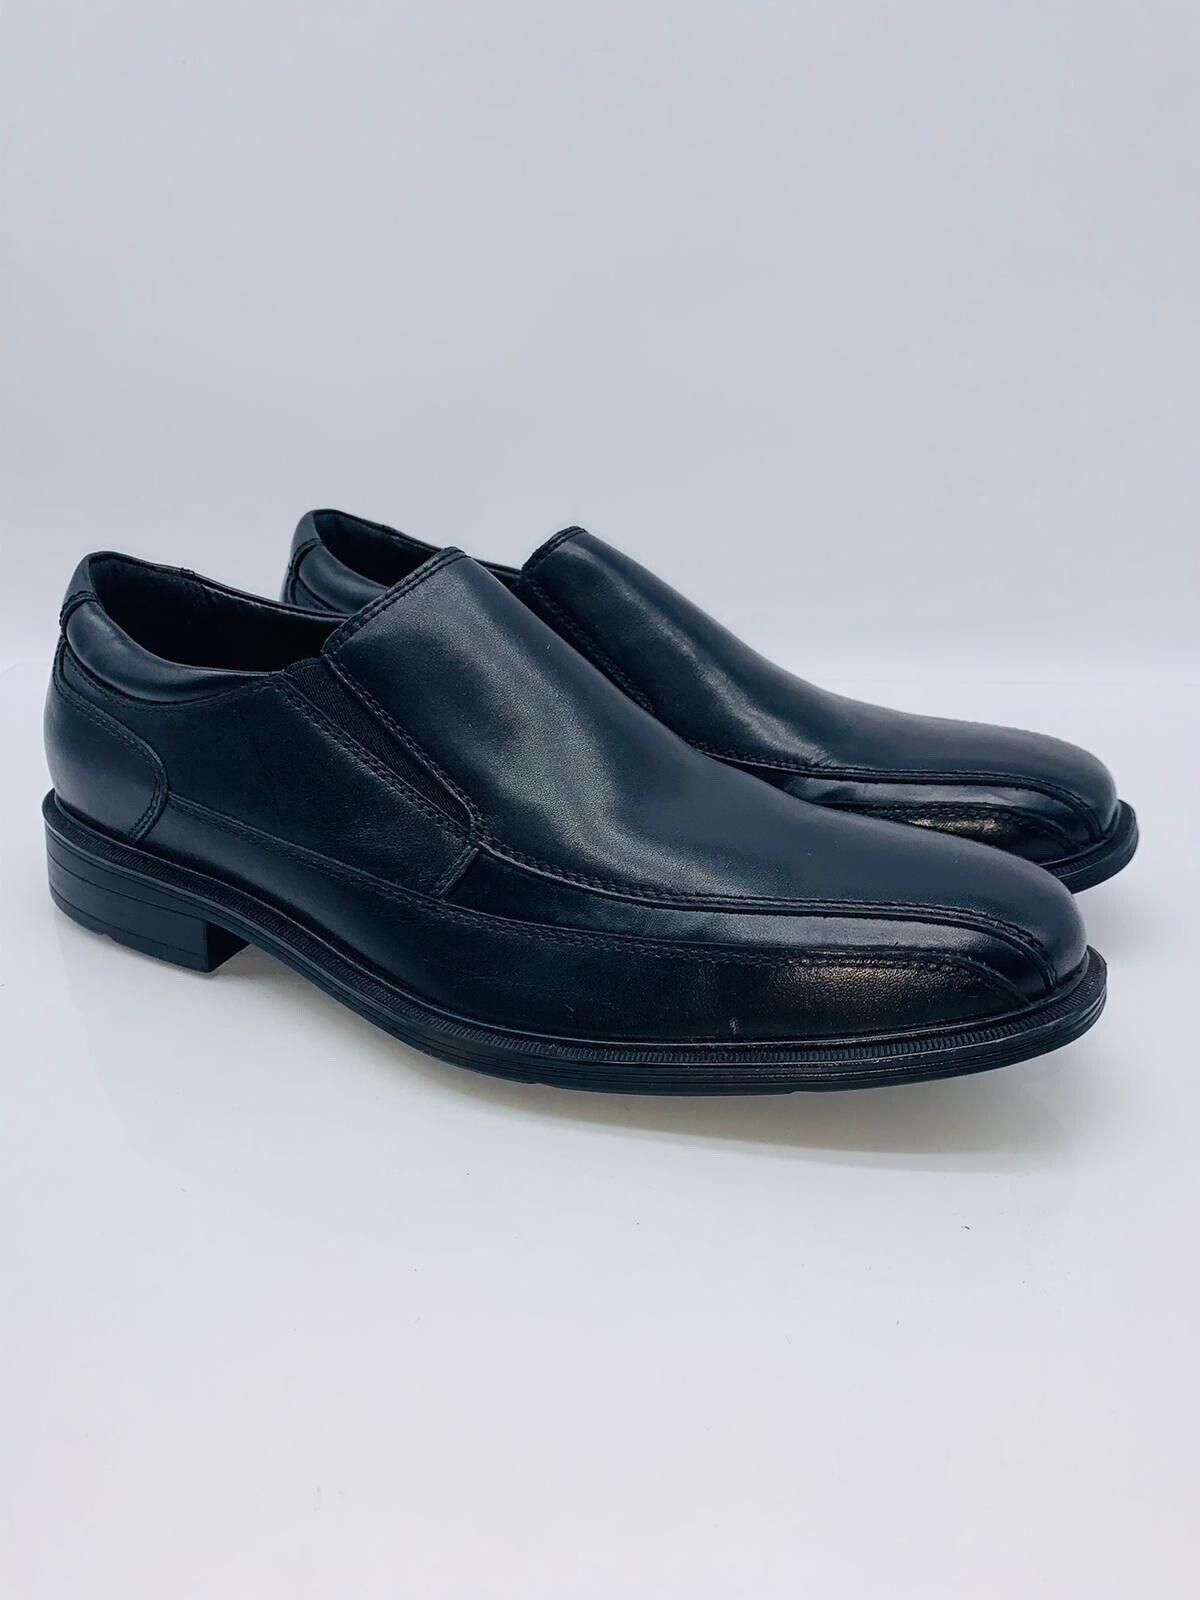 Kenneth Cole New York Men Len Slip-On Shoes Black Leather US 9.5 EUR 42.5 #G-11